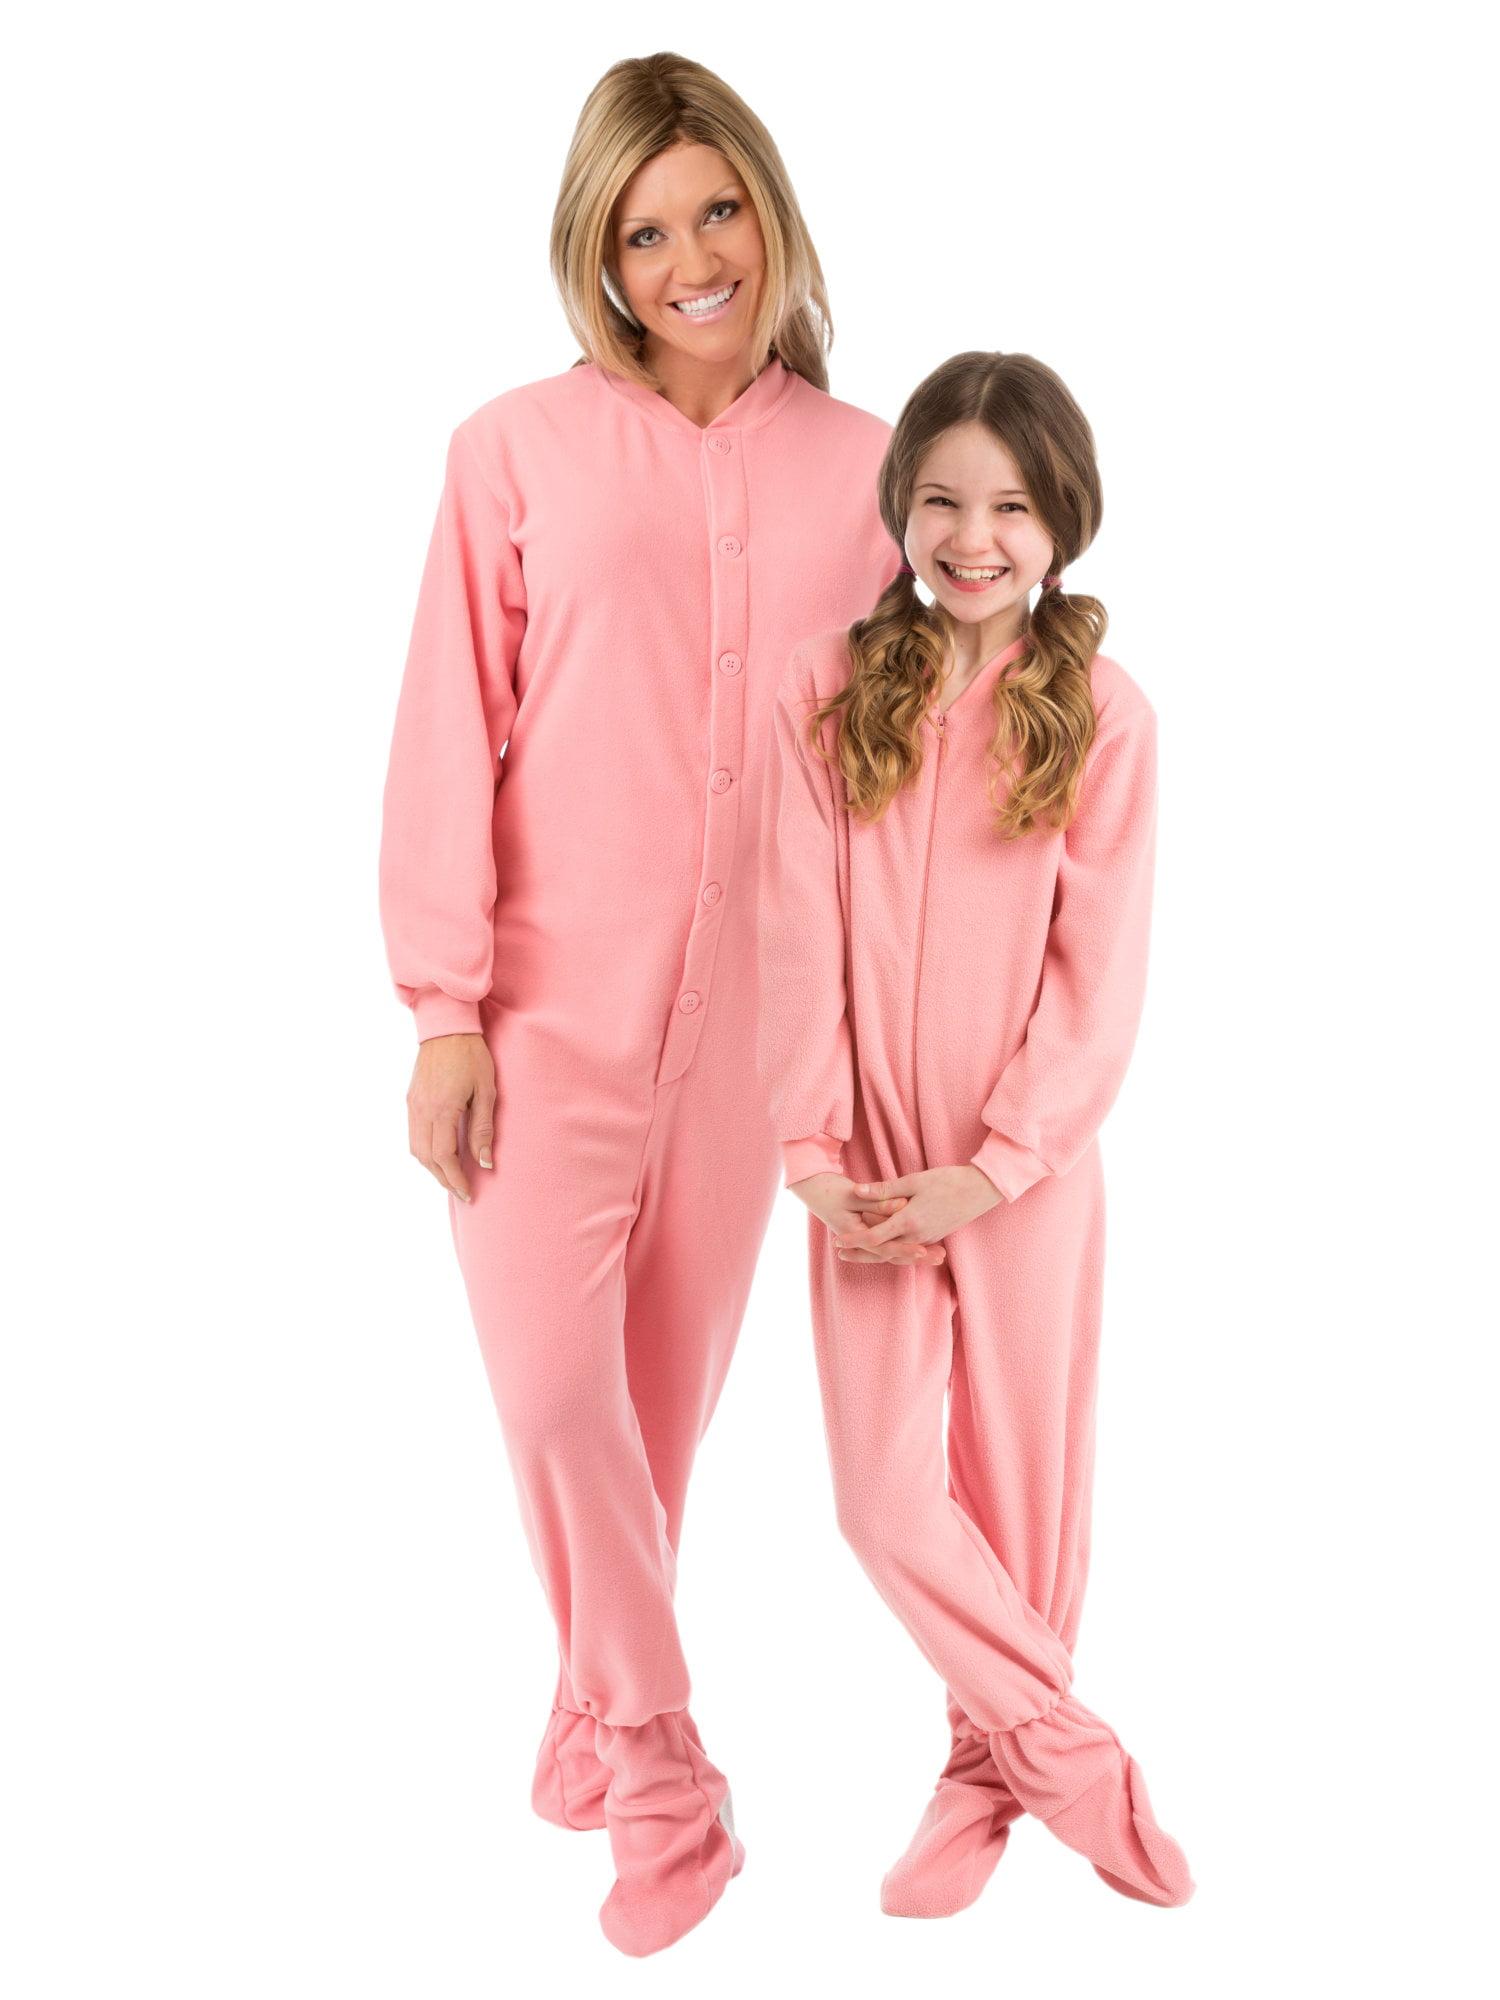 832b4f0e41b4 Big Feet Pajamas - Big Feet Pjs Big Girls Kids Pink Fleece Footed ...